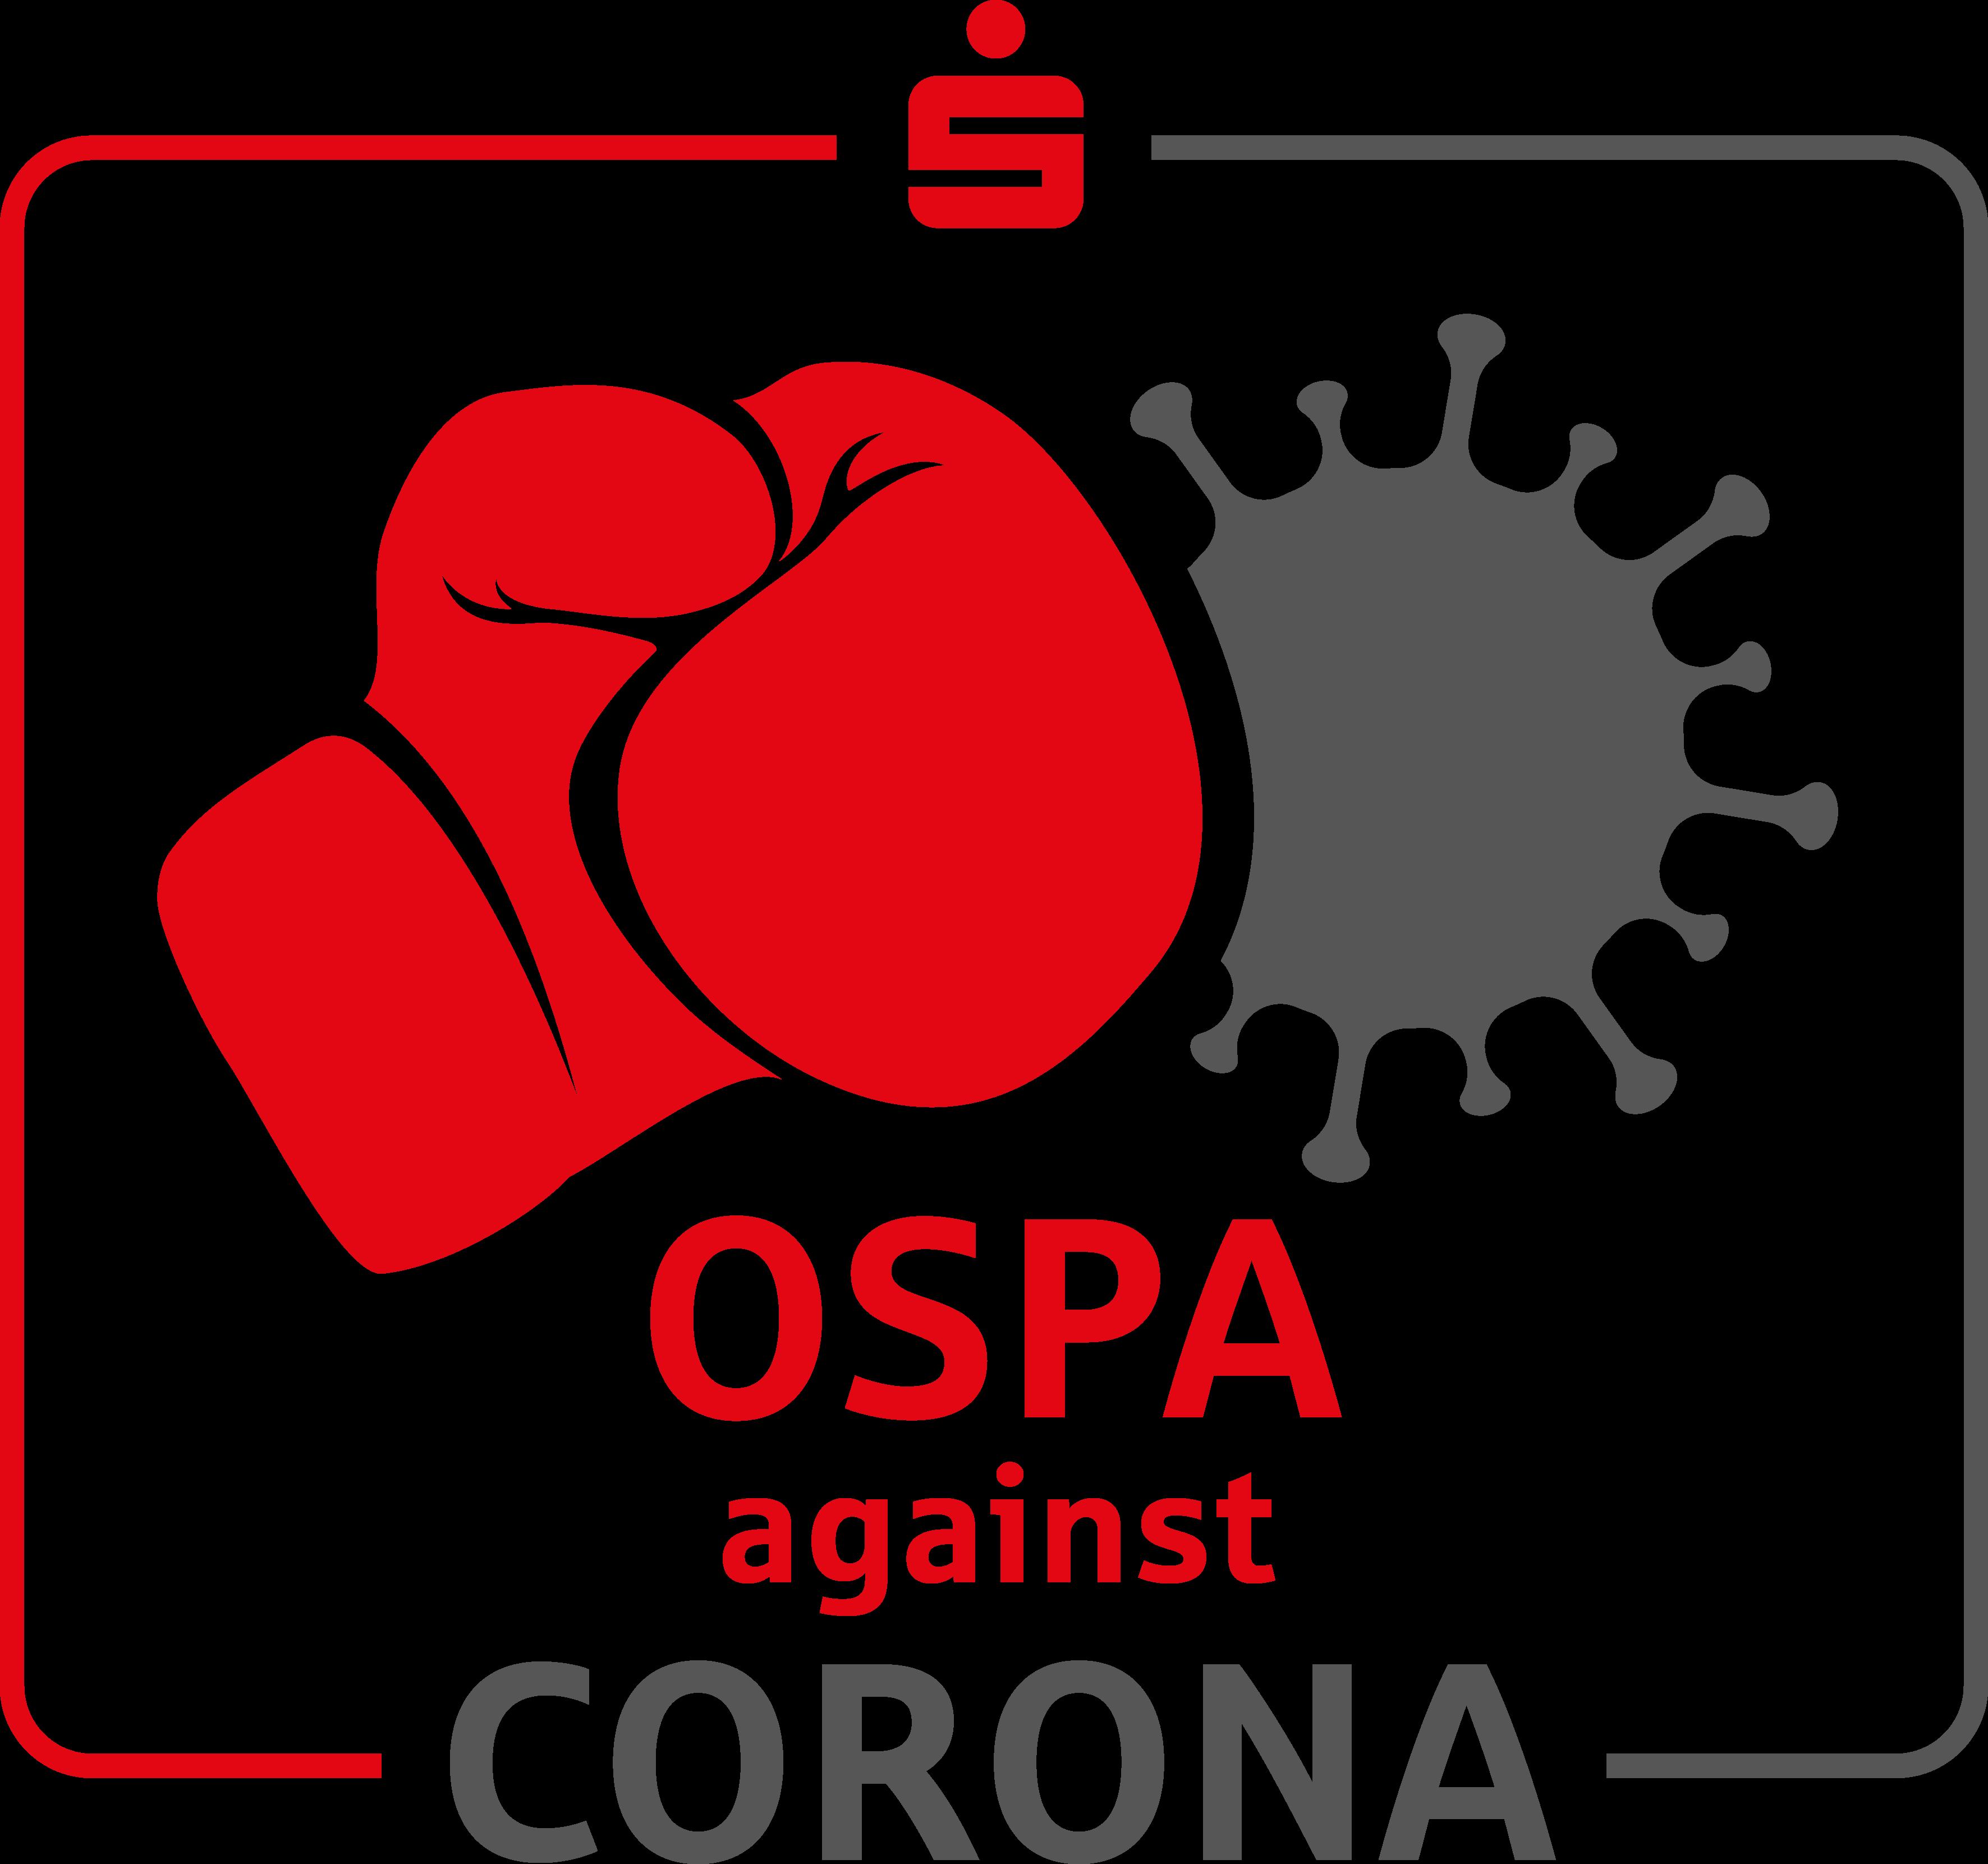 OSPA against Corona – innoXperts und die OSPA